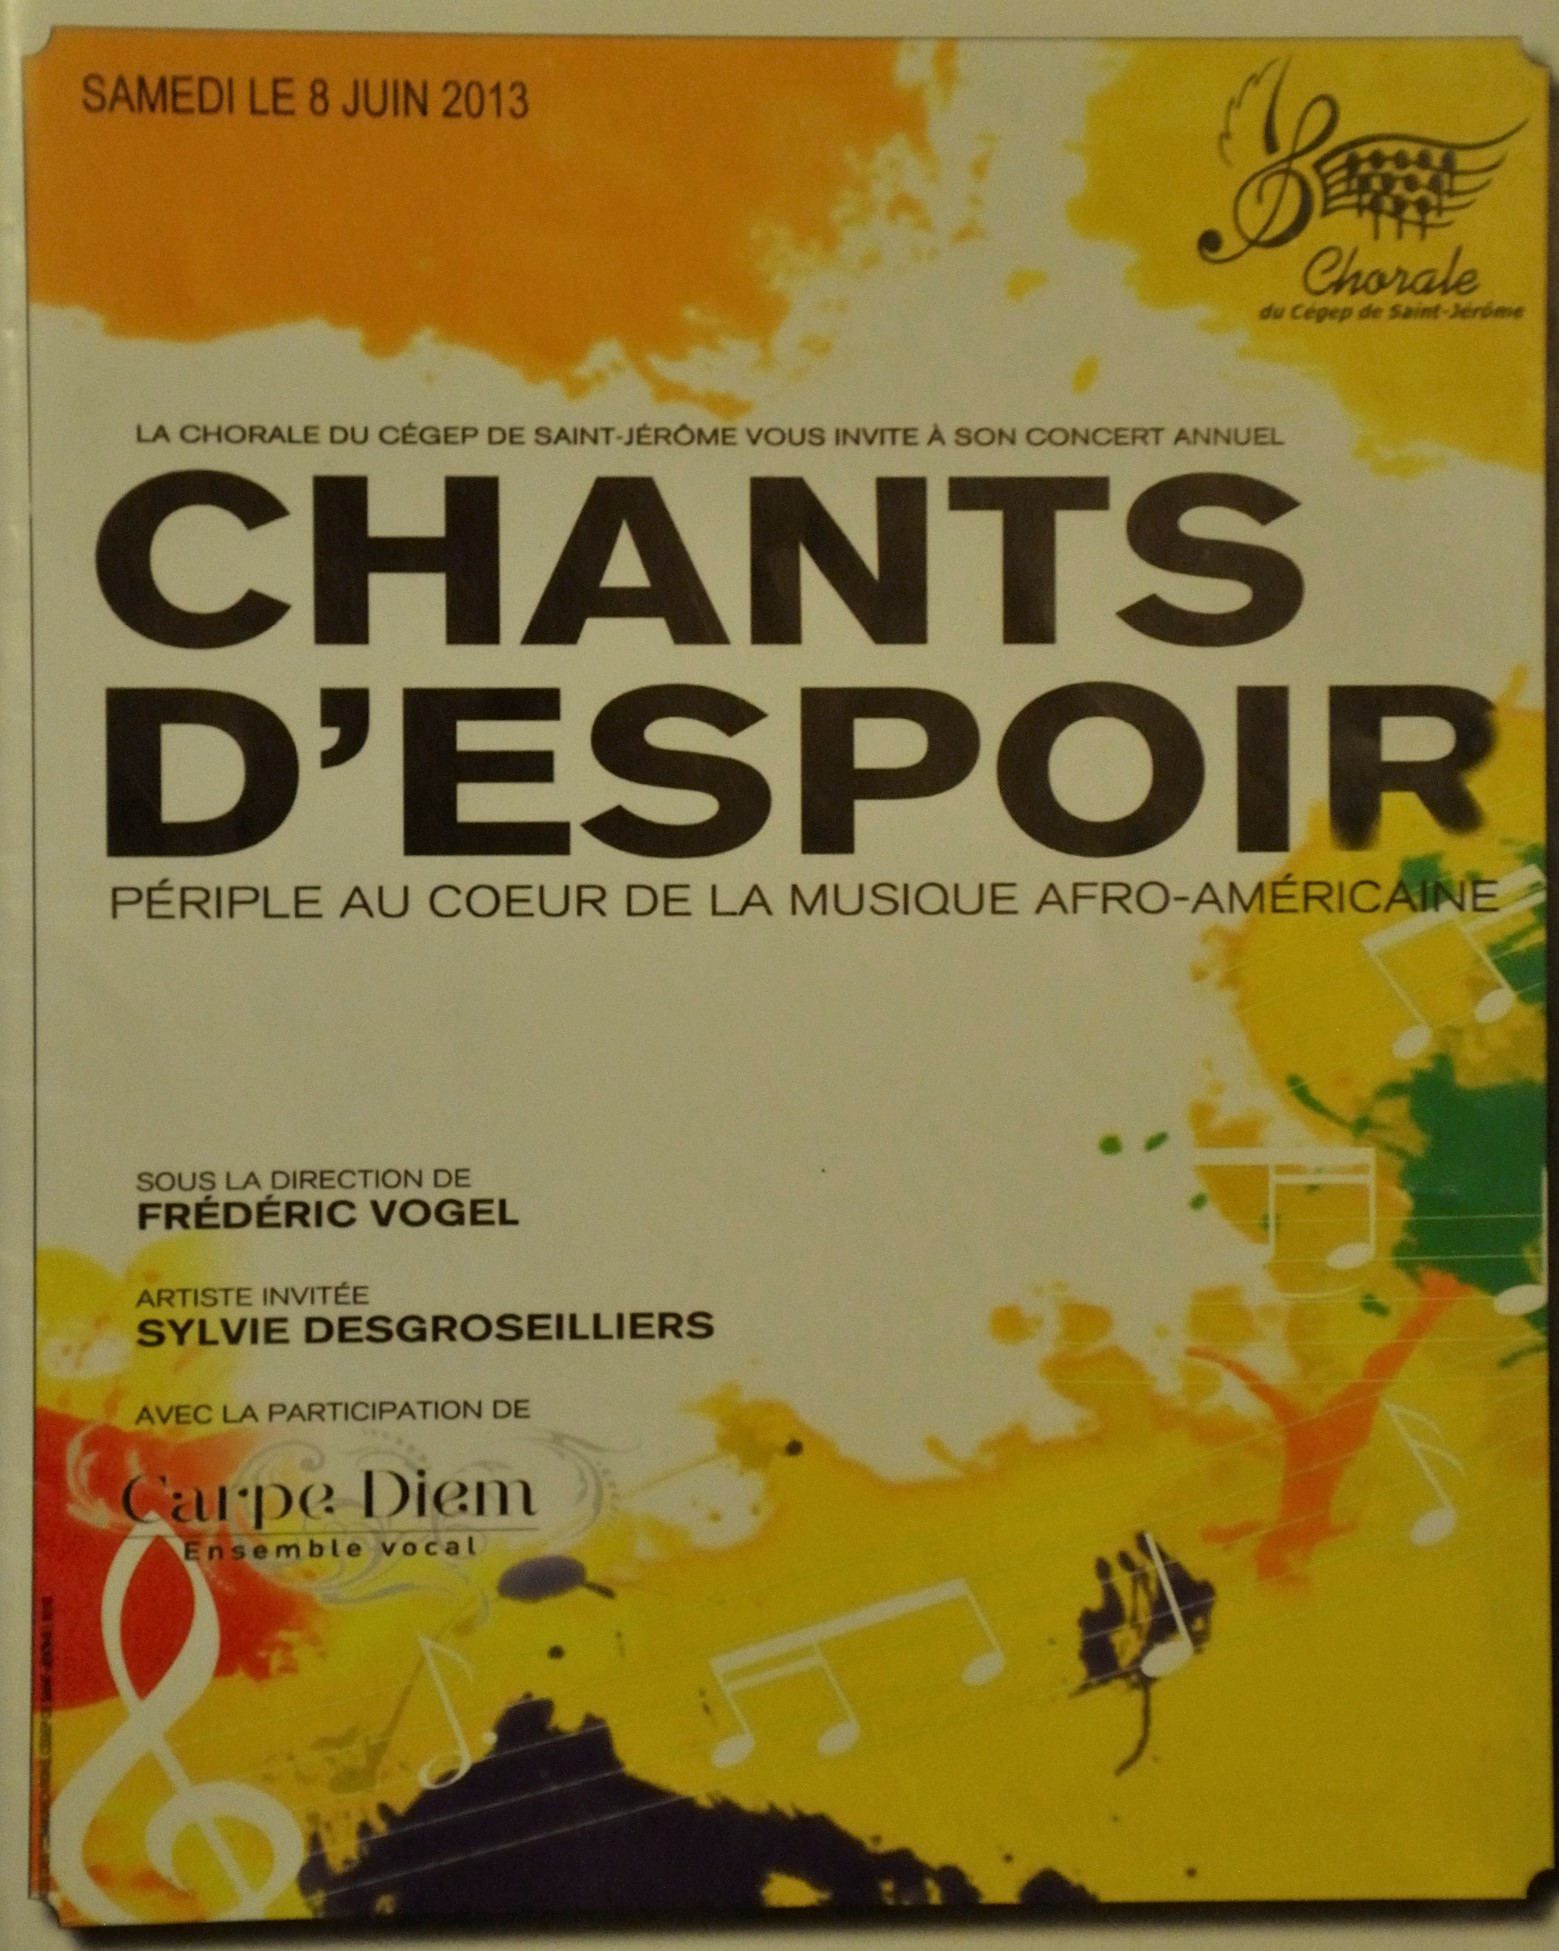 2013-8juin Chants d'espoir